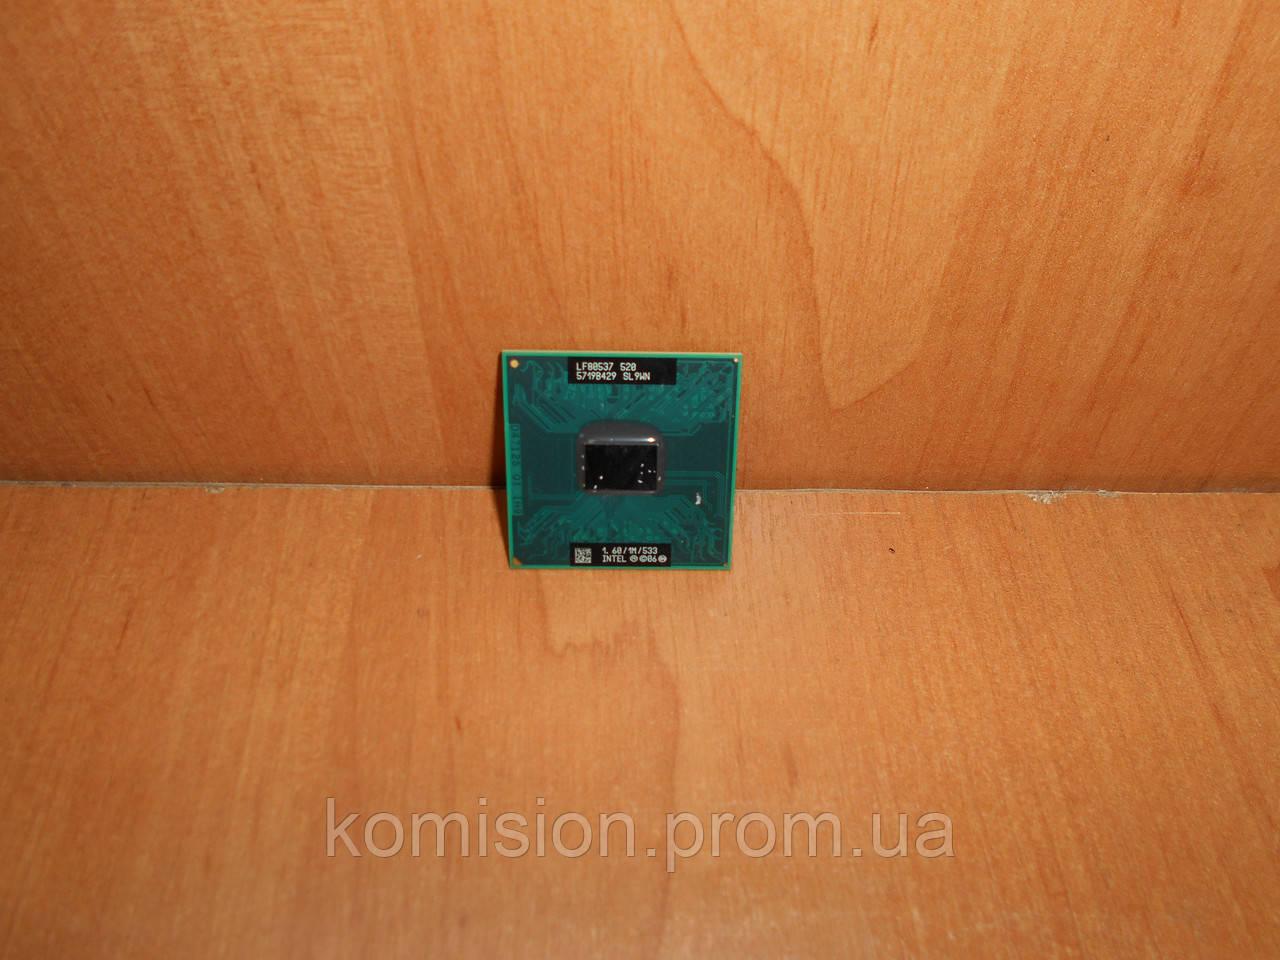 Процессор INTEL Celeron M 520 1,6 GHz